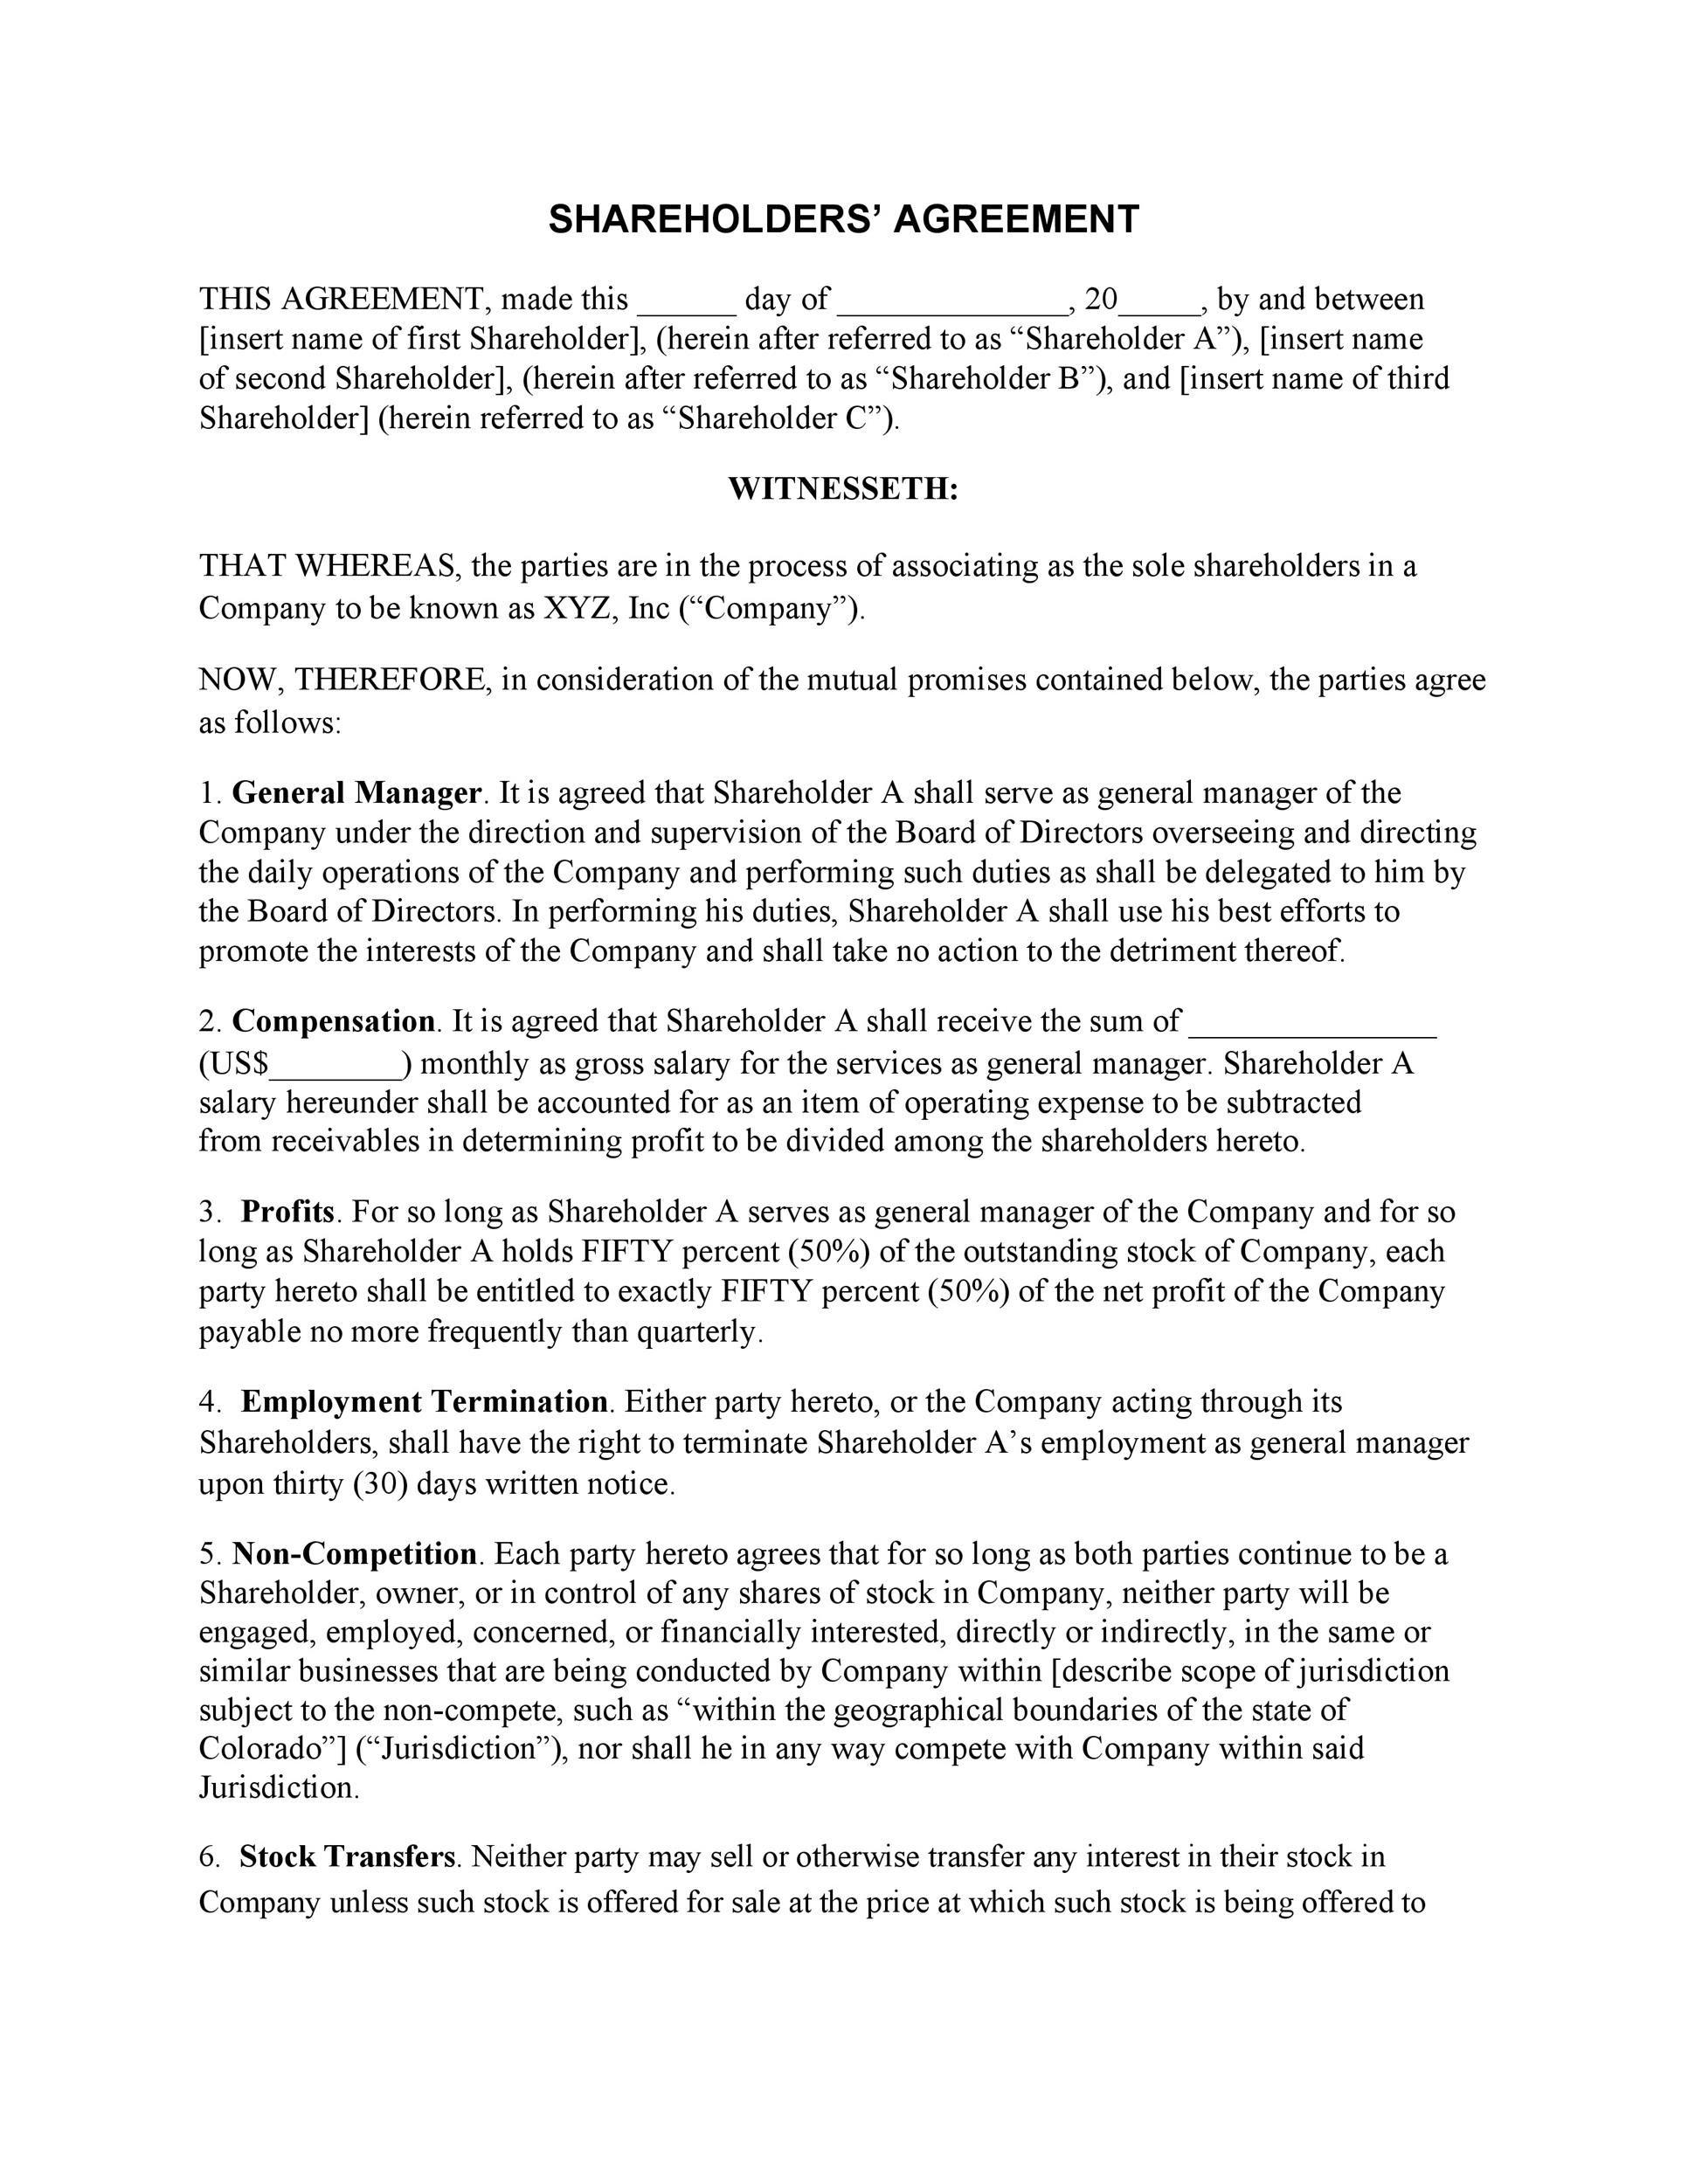 Shareholders Agreement Template Free Free Download Template Free Templates Agreement